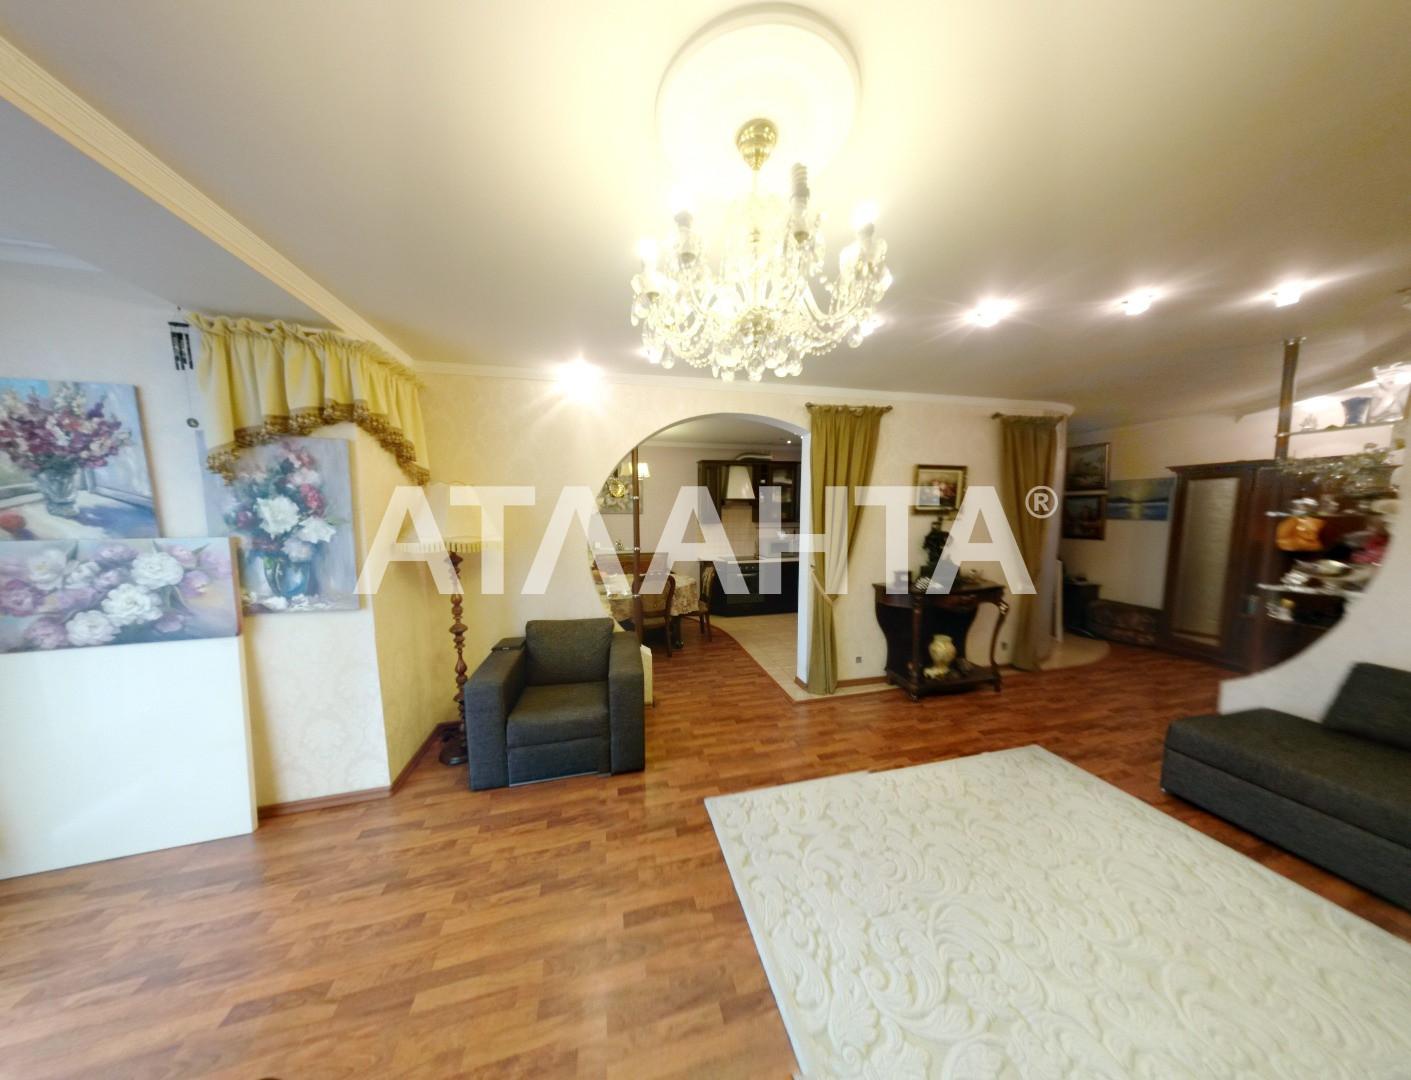 Продается 3-комнатная Квартира на ул. Ул. Ломоносова — 139 600 у.е. (фото №4)